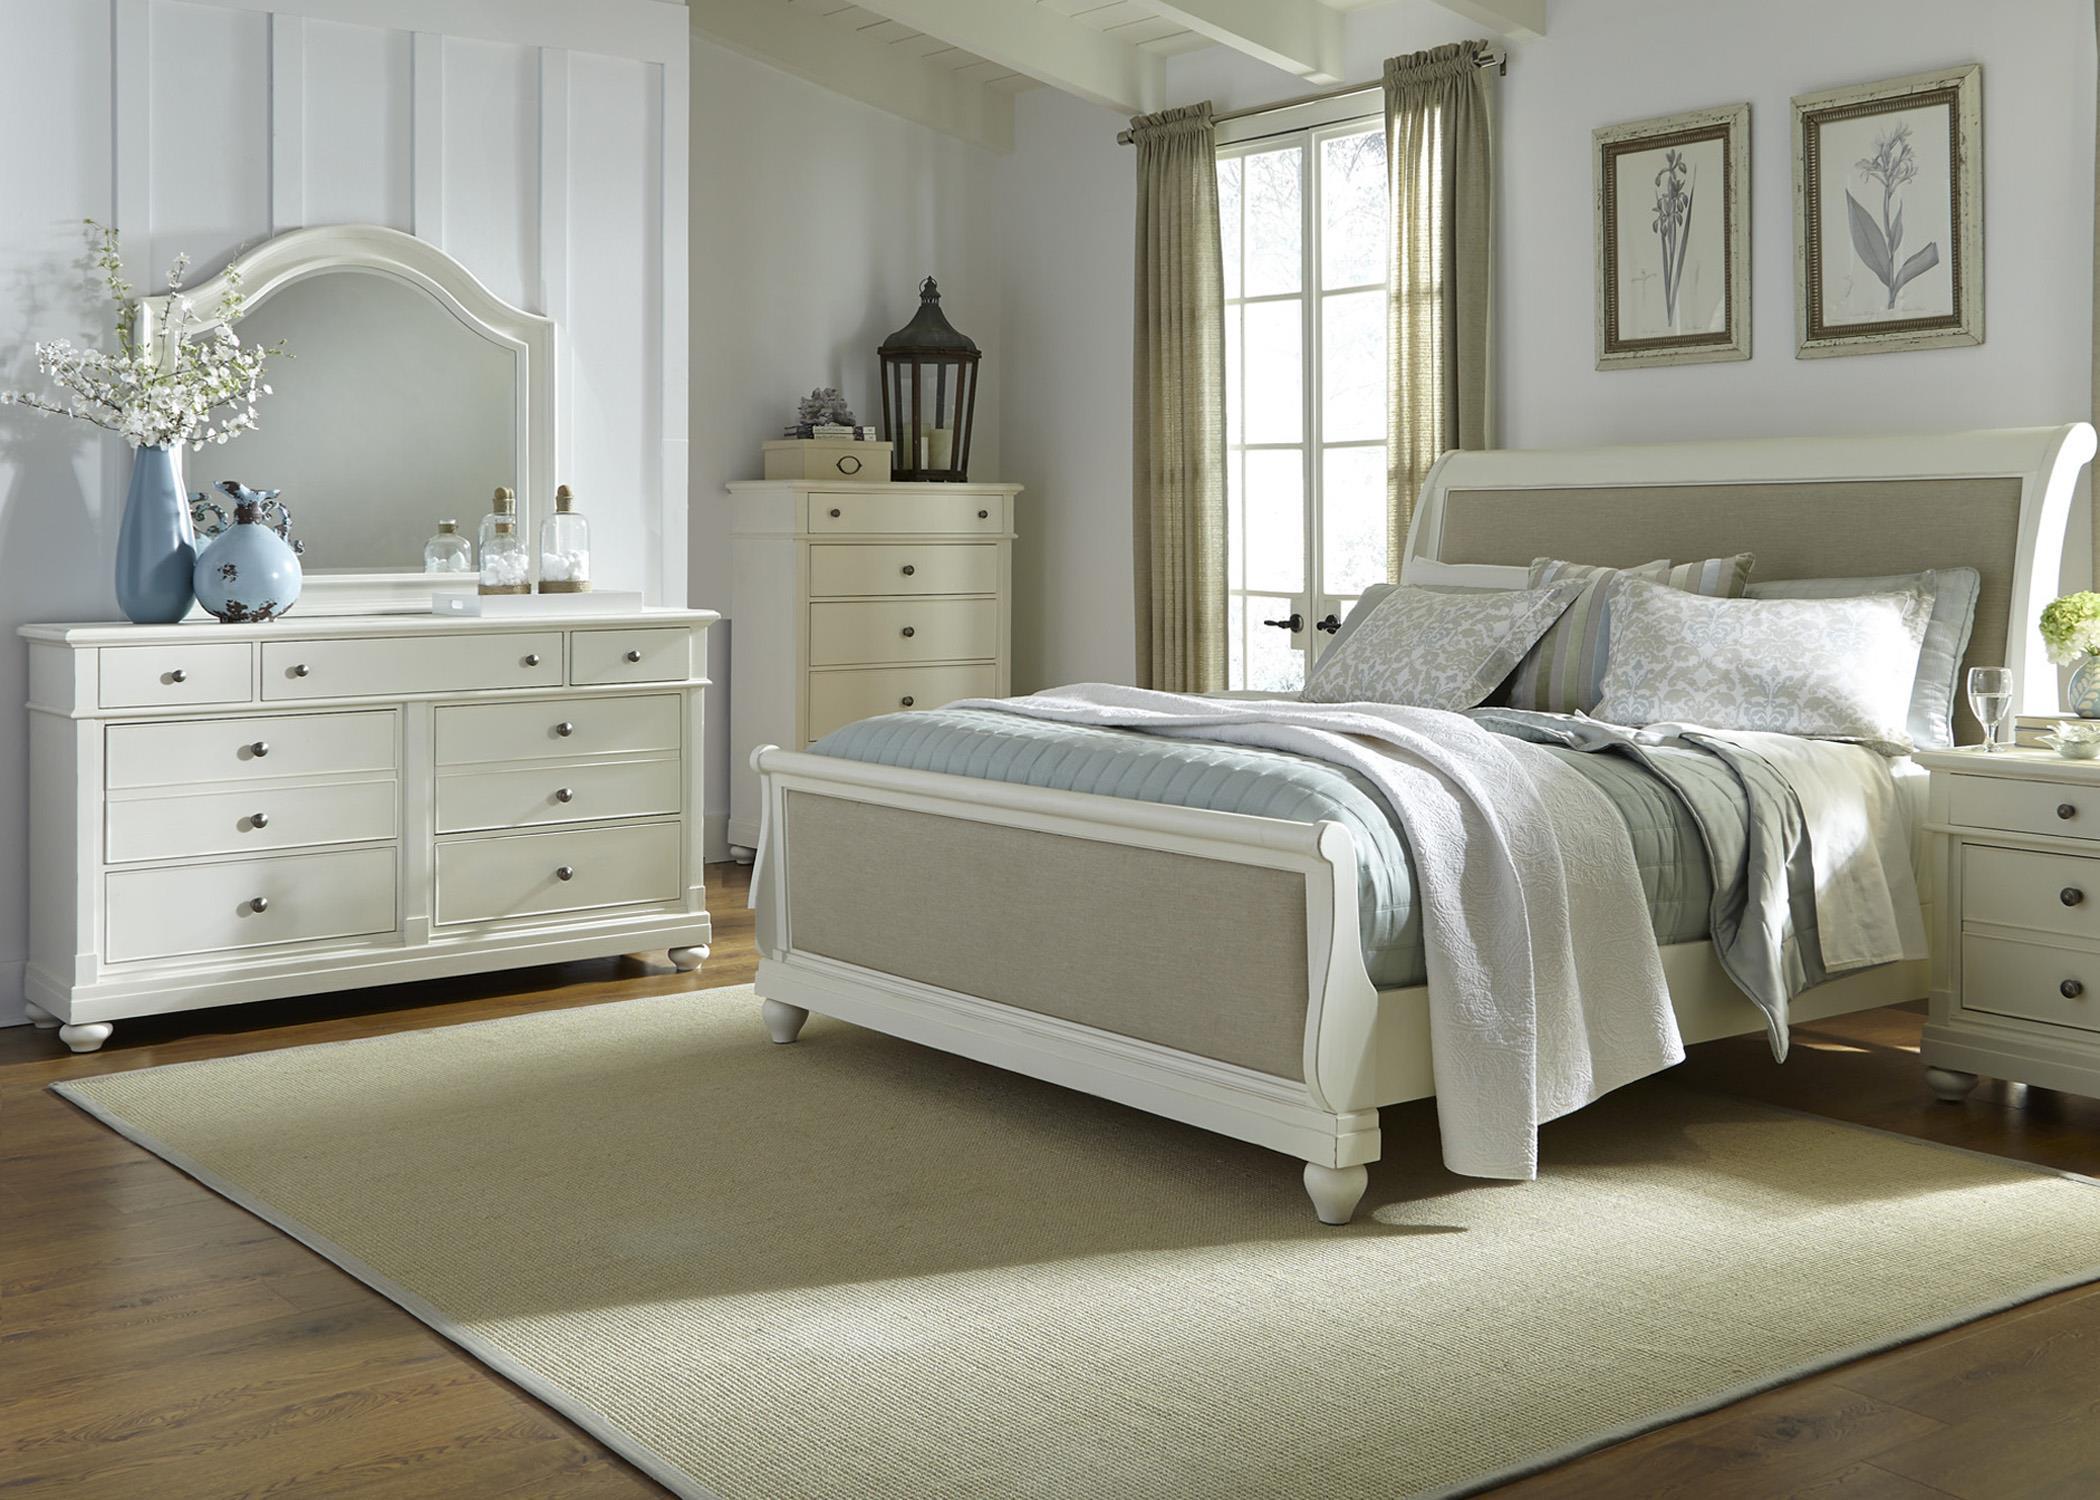 Liberty Furniture Harbor View King Bedroom Group - Item Number: 631-BR-KSLDMC